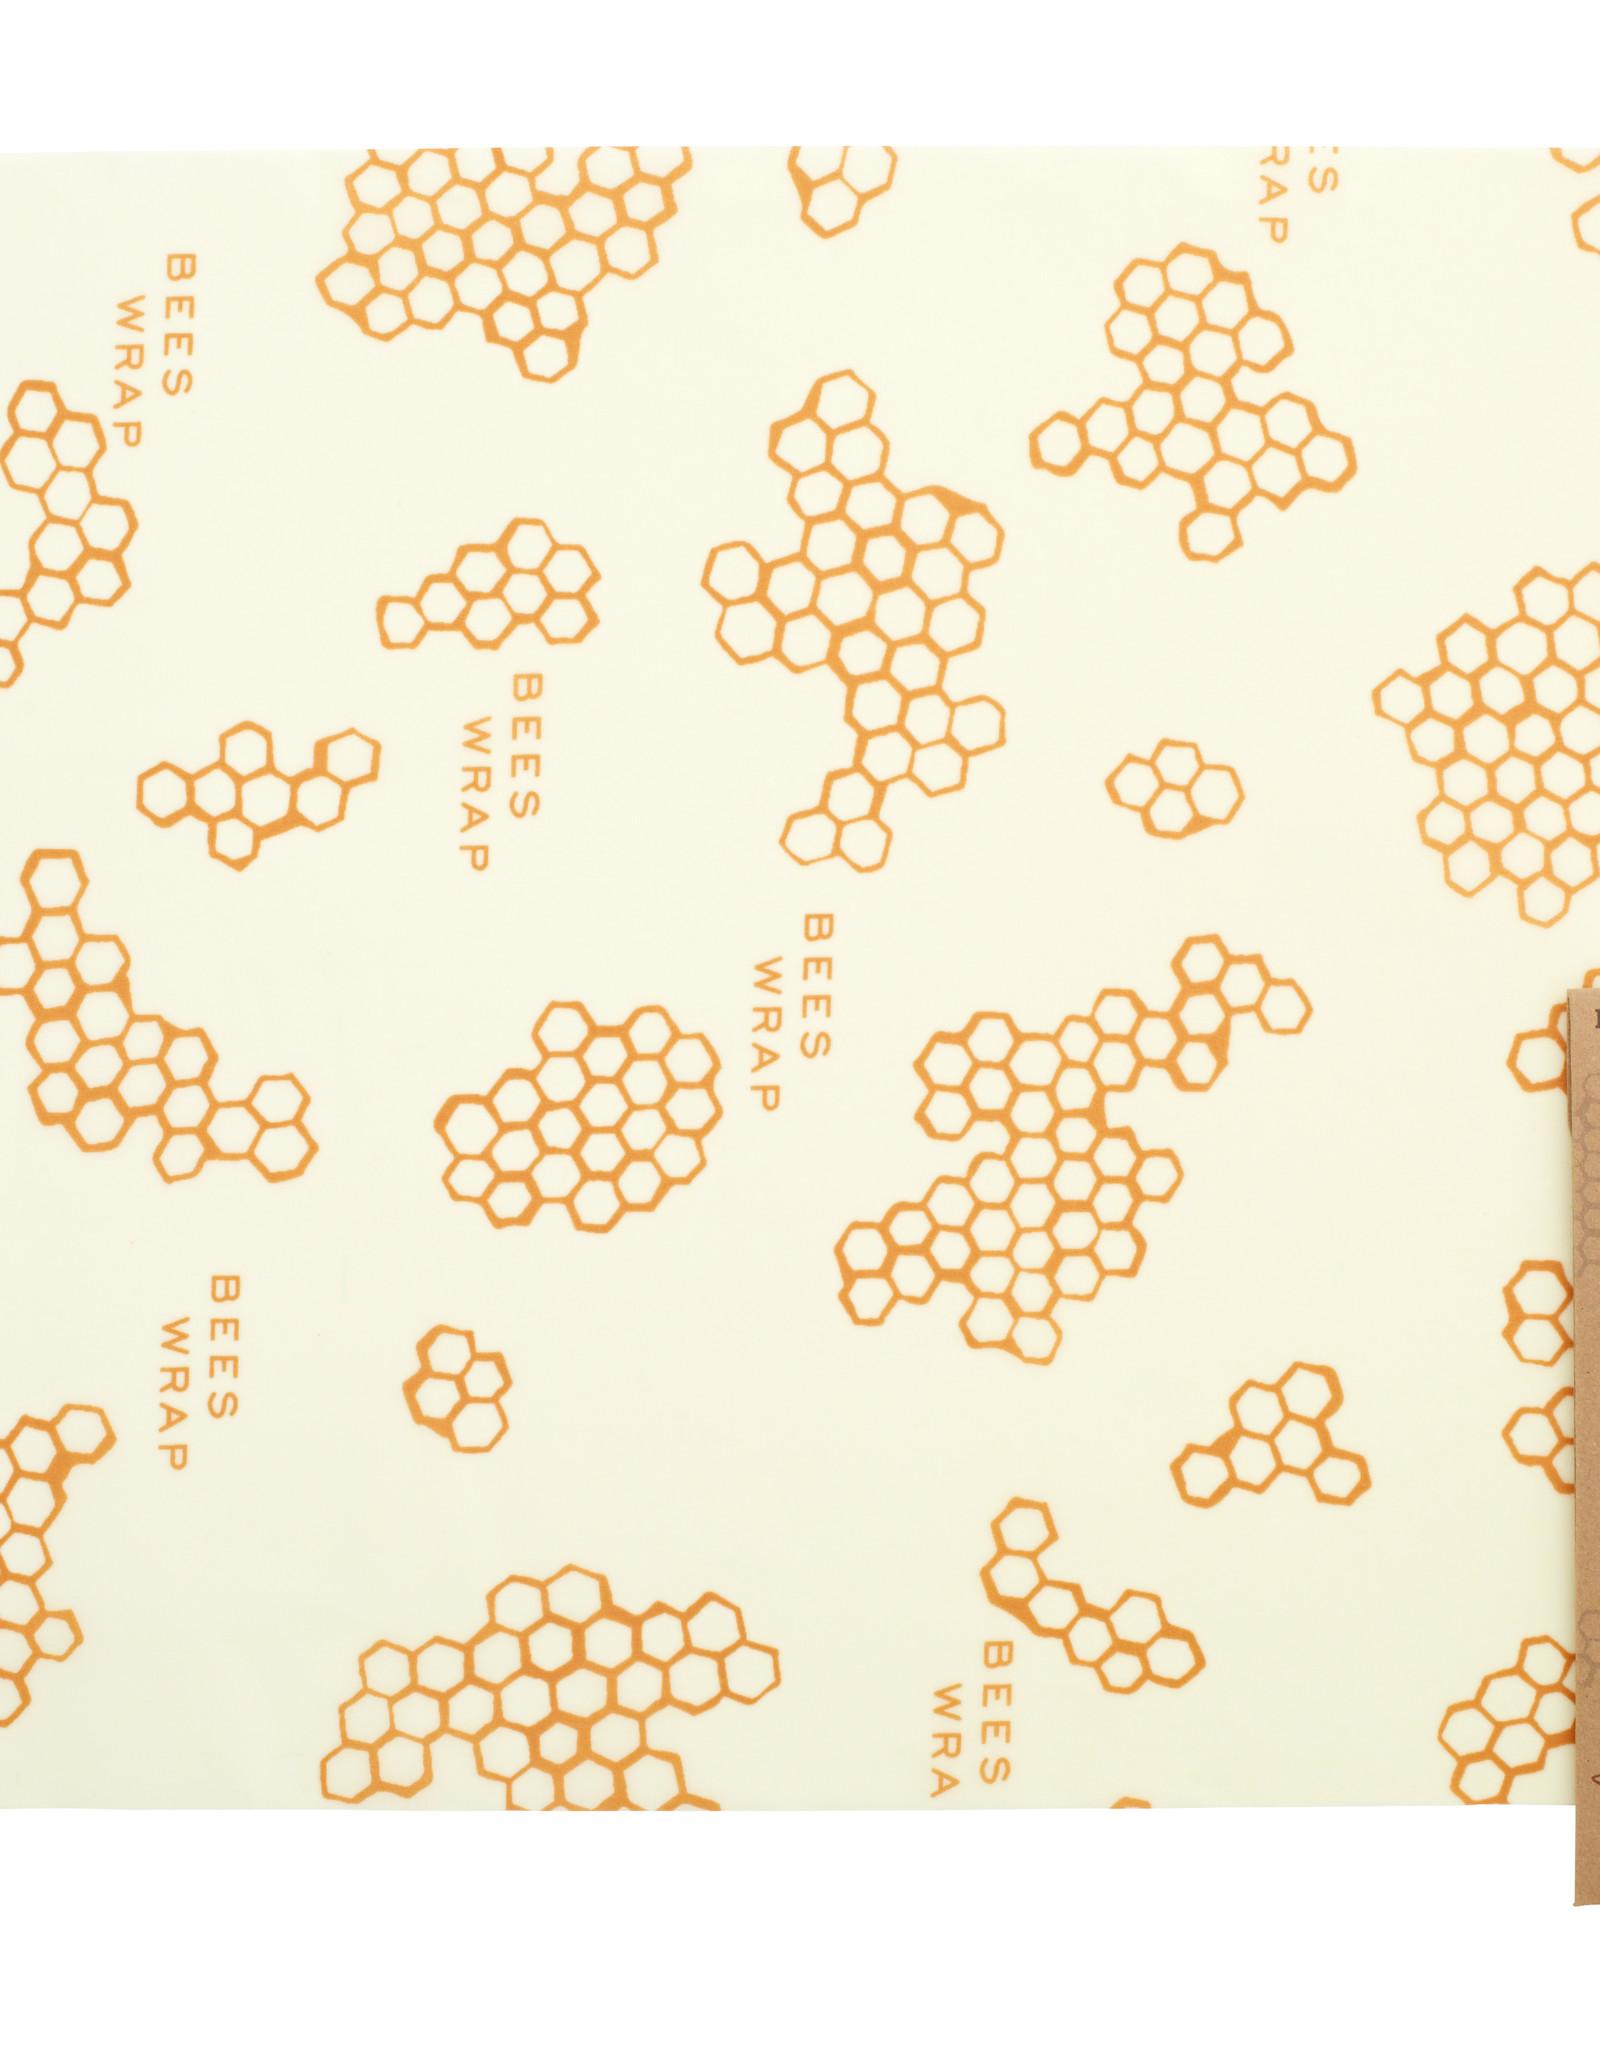 Bee's Wrap Bijenwasdoek brood(je)